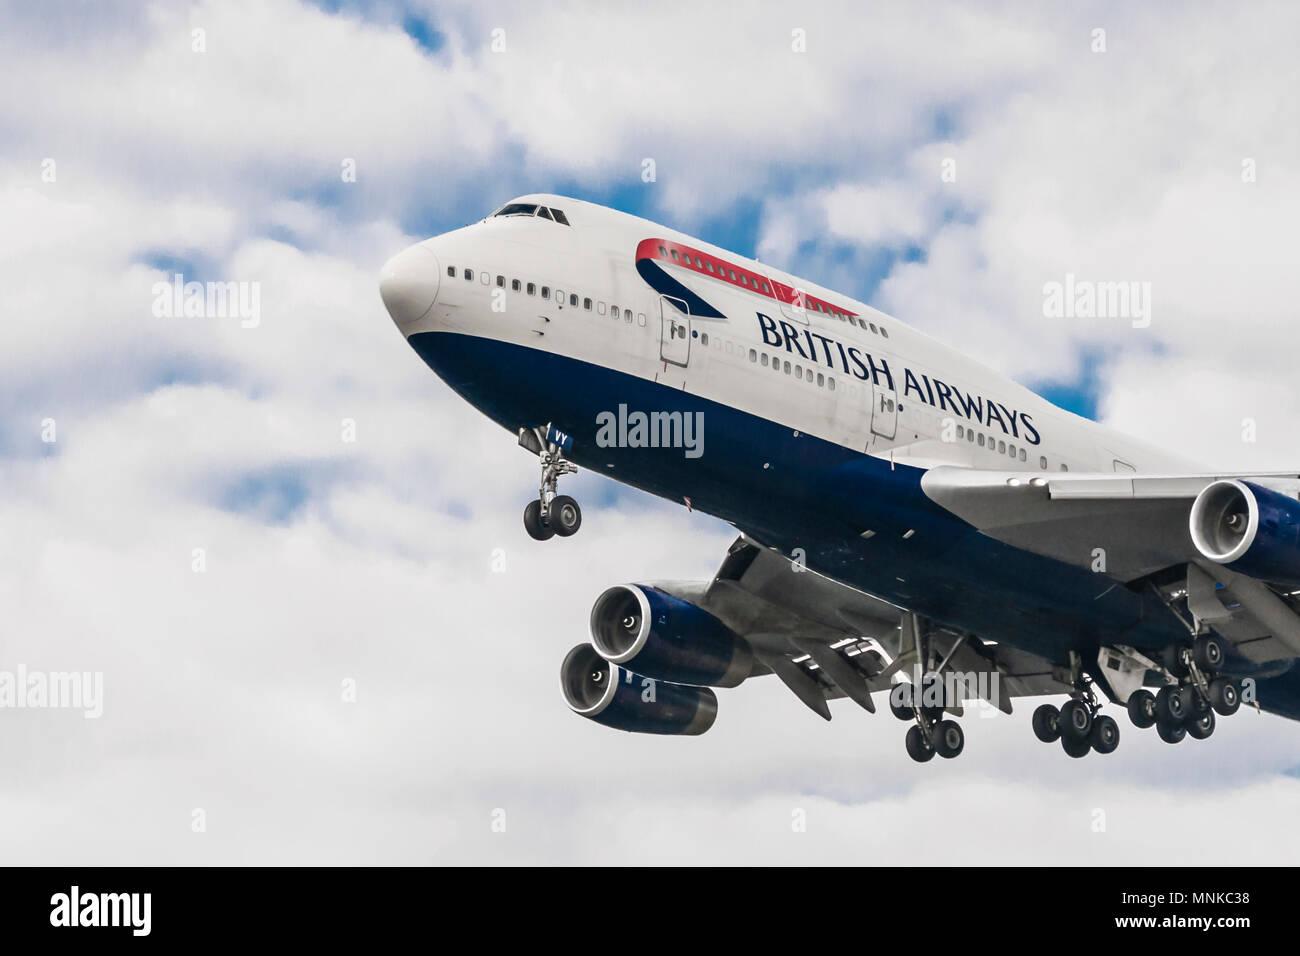 LONDON, UK - AUGUST, 6 2013; A British Airways Airbus Boeing 747 landing at London Heathrow Airport Stock Photo